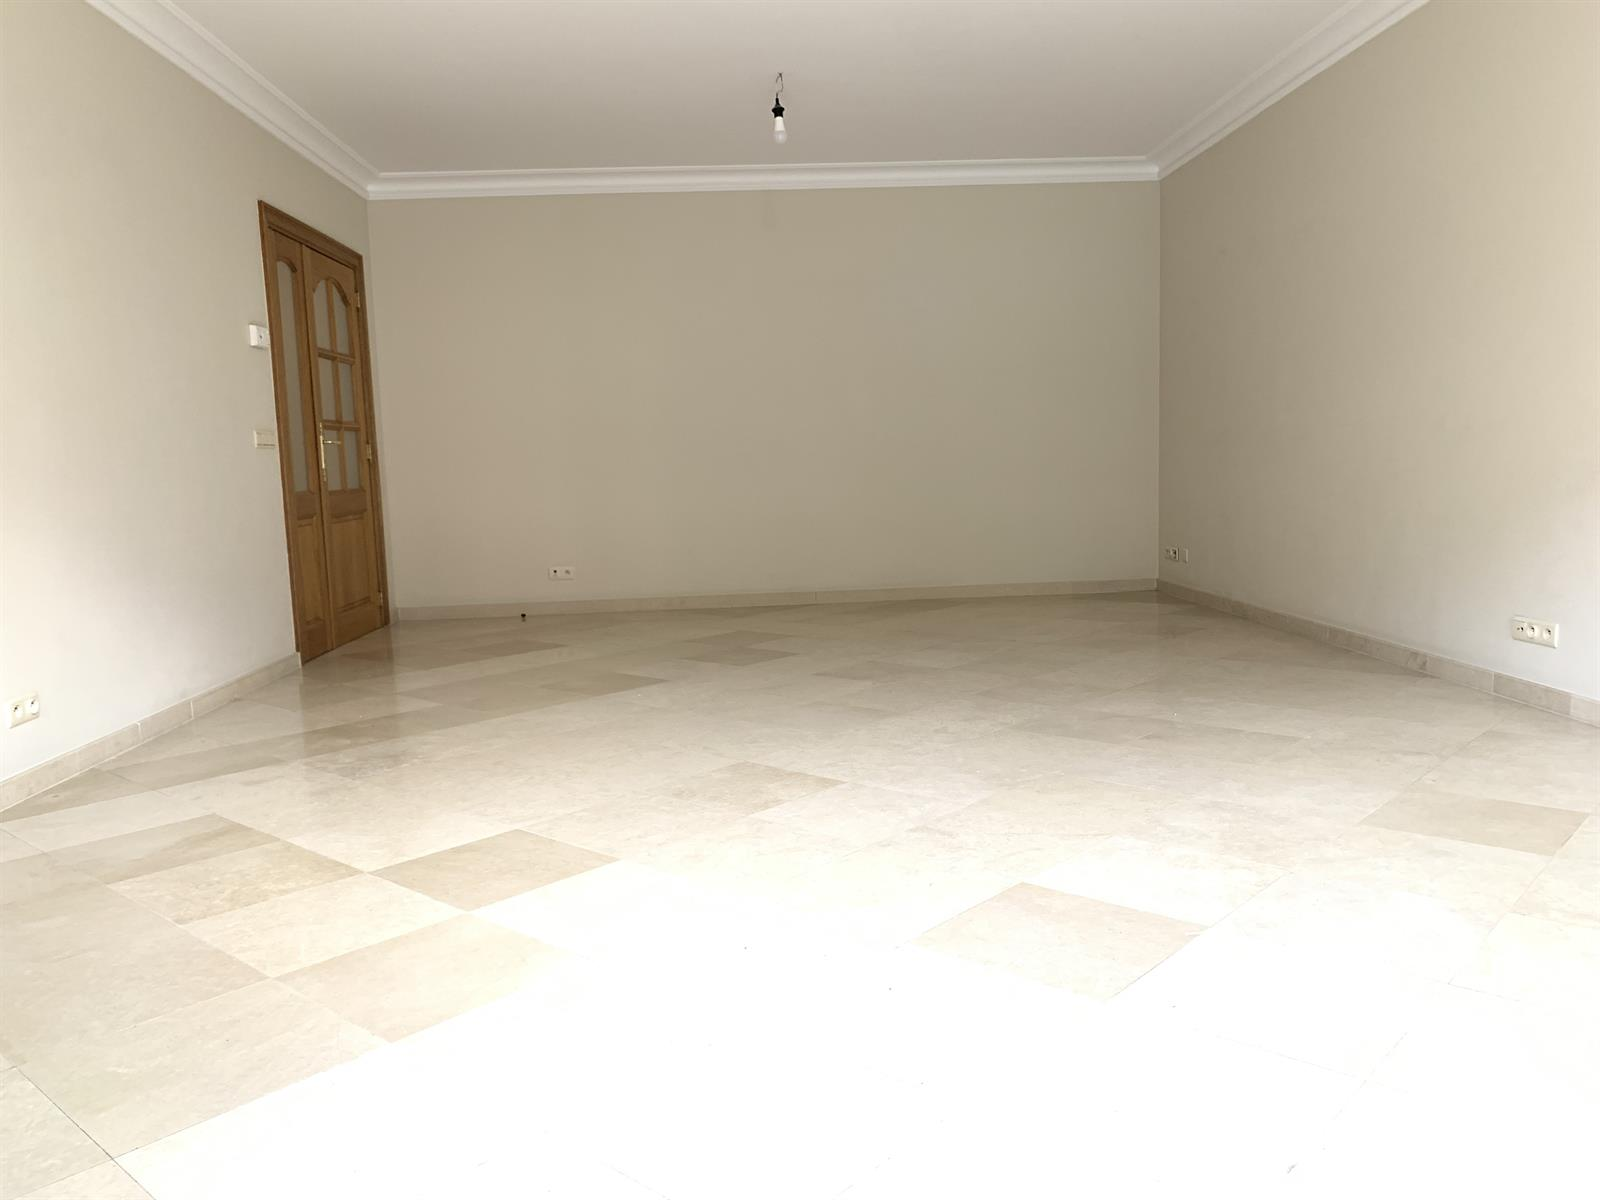 Appartement exceptionnel - Woluwe-Saint-Pierre - #4433539-22